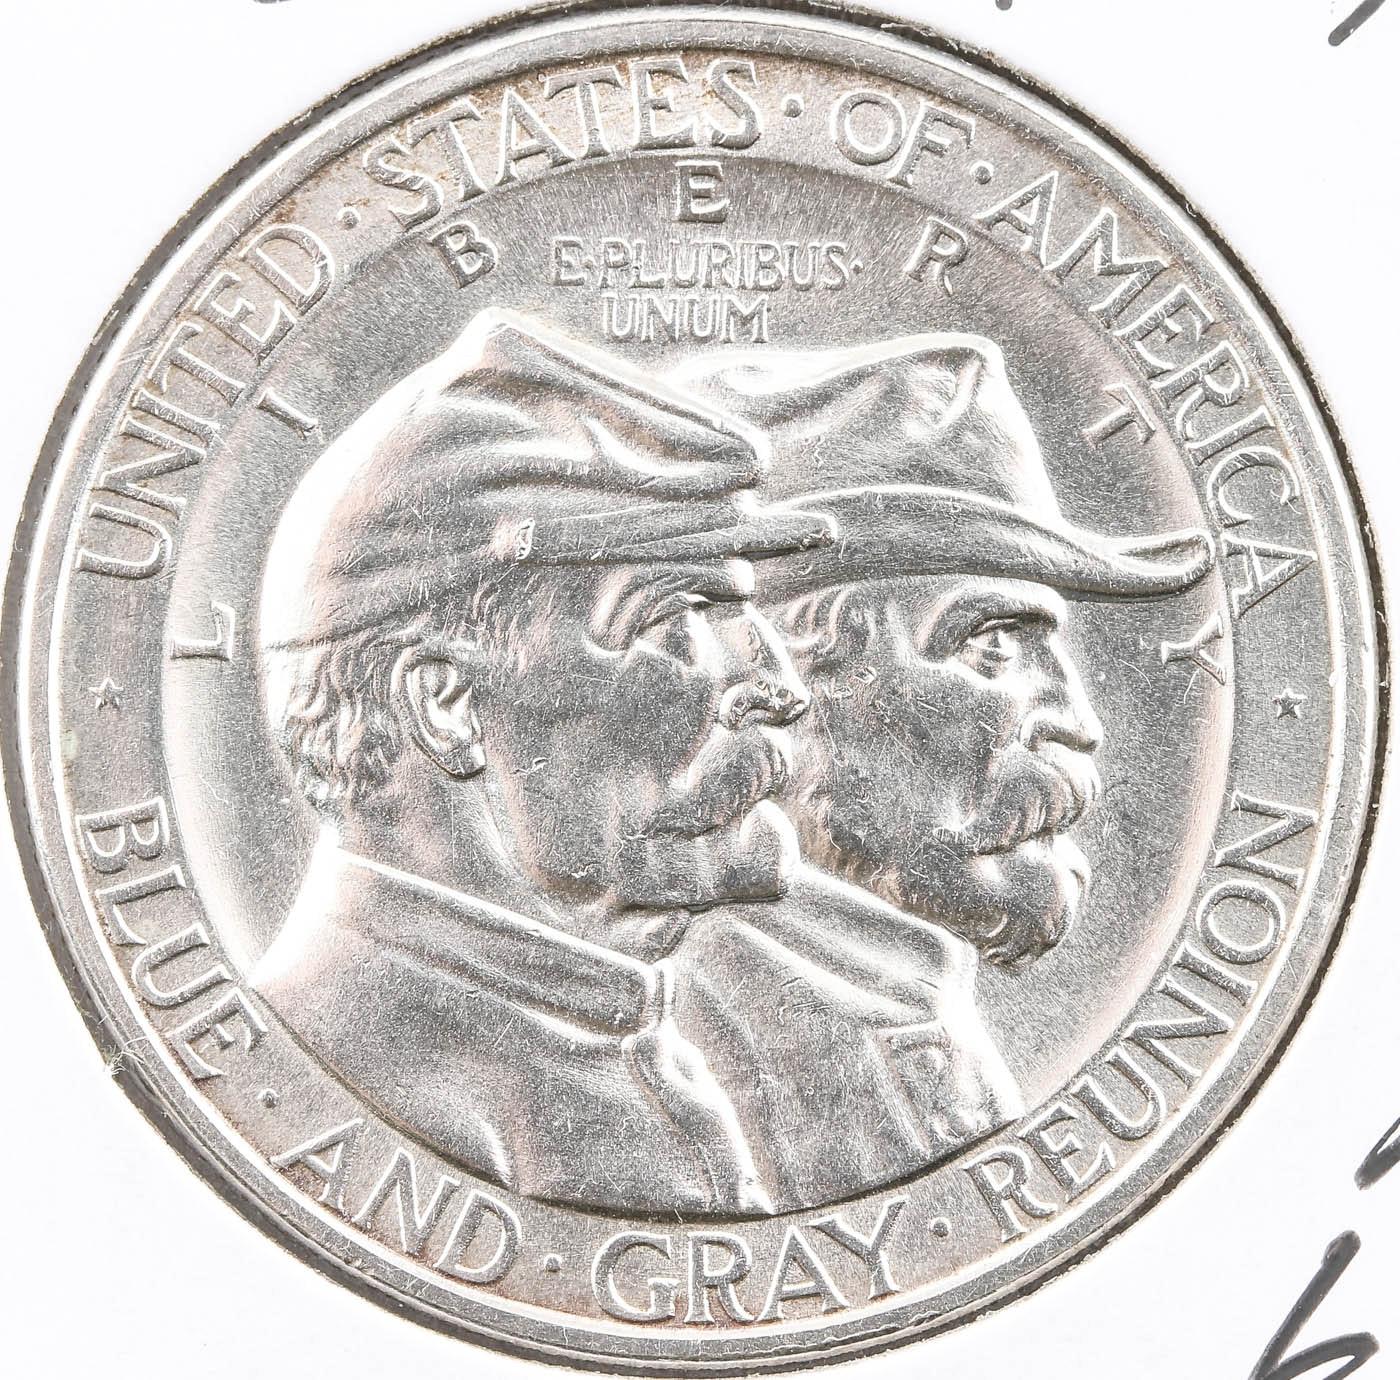 1936 Gettysburg Commemorative Silver Half Dollar